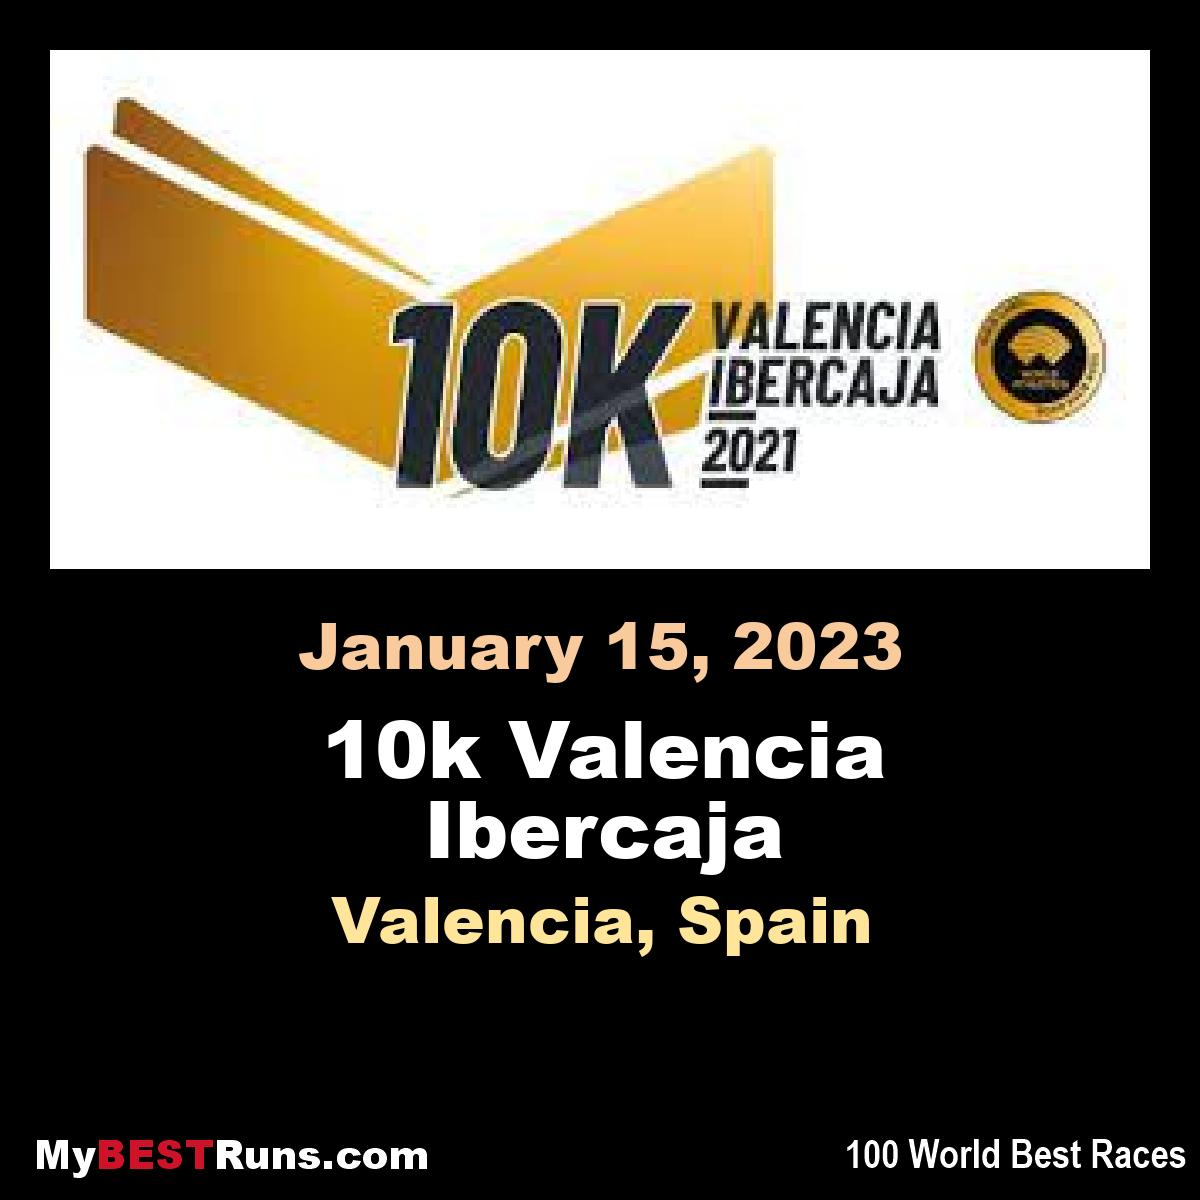 10k Valencia Ibercaja